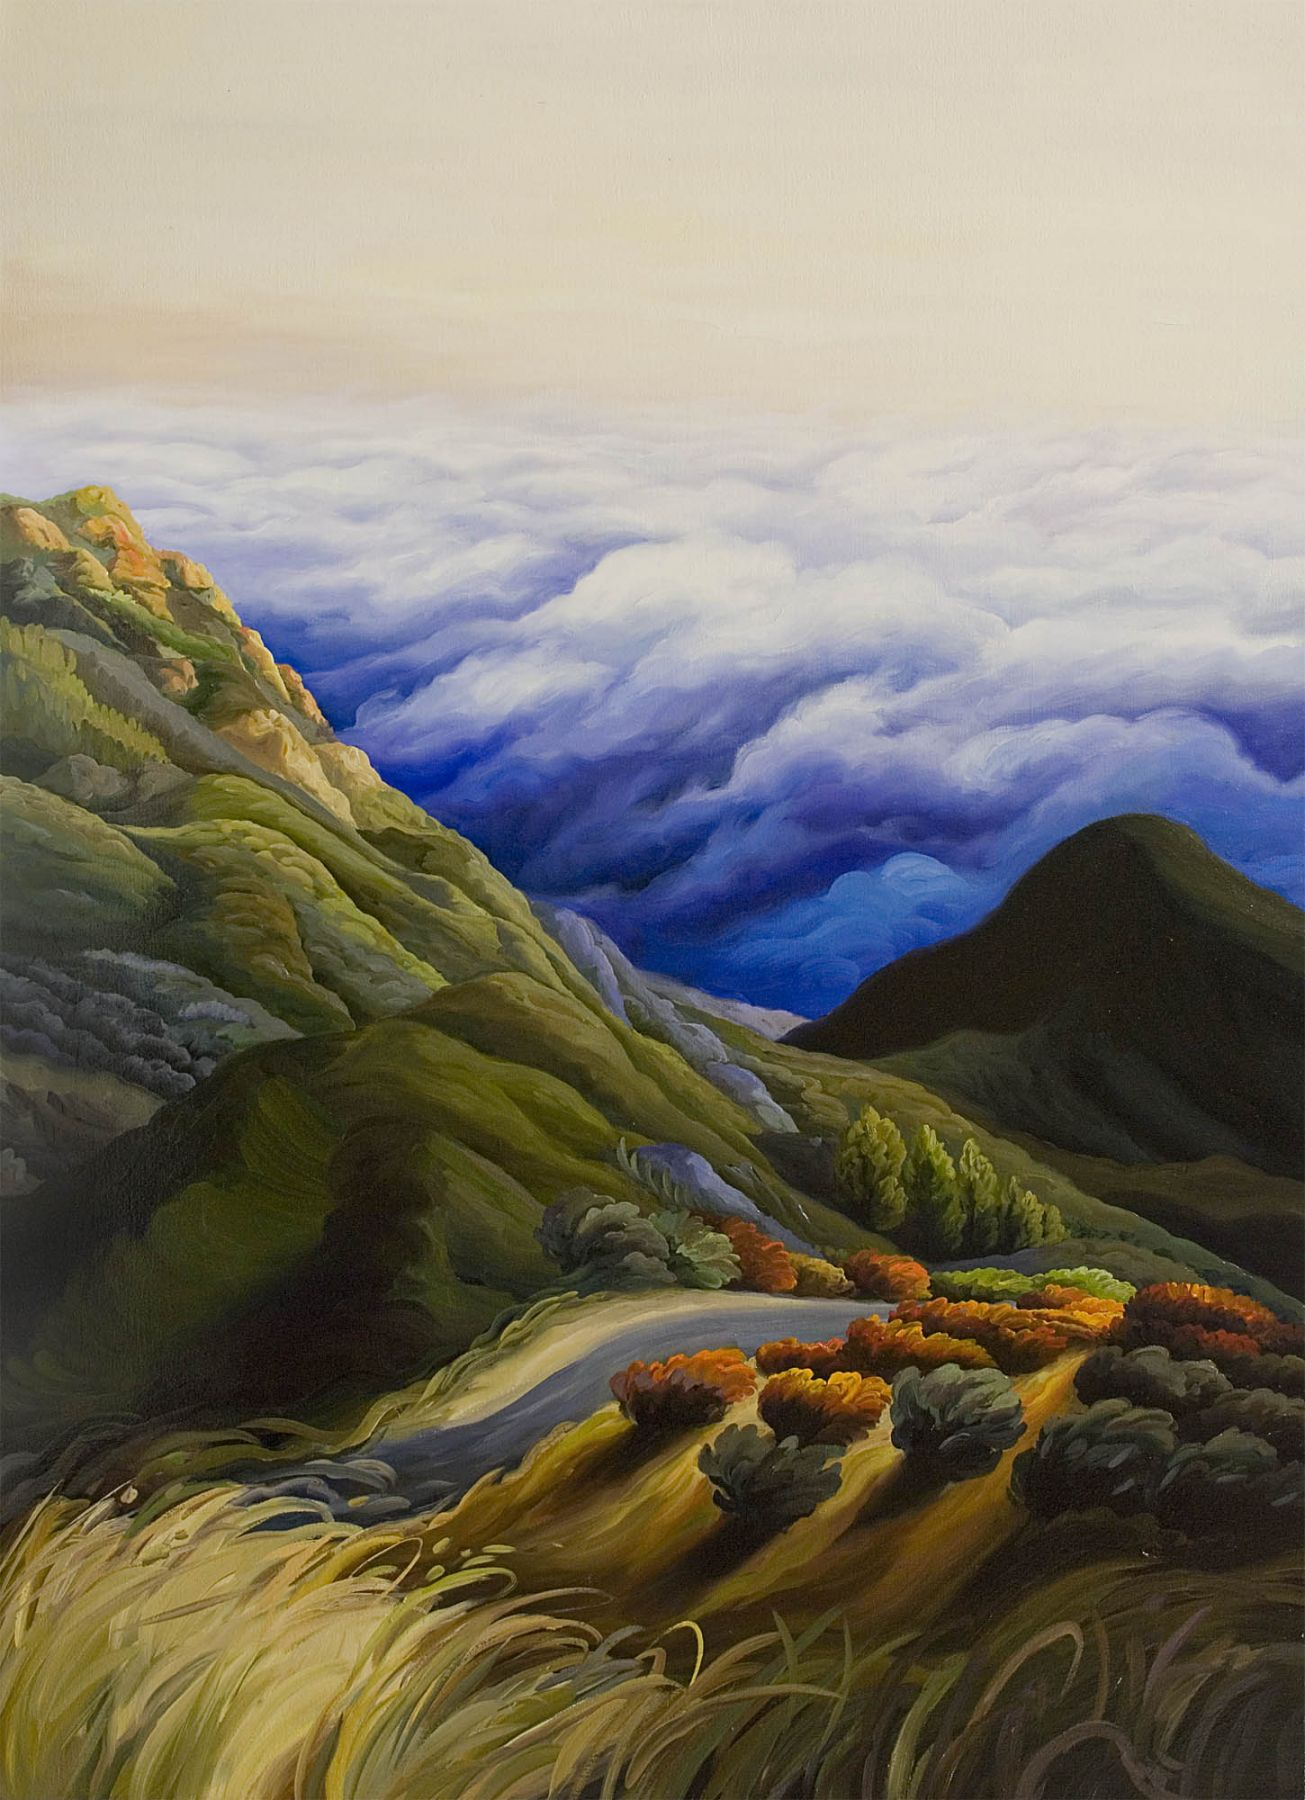 Phoebe Brunner, De La Cresta